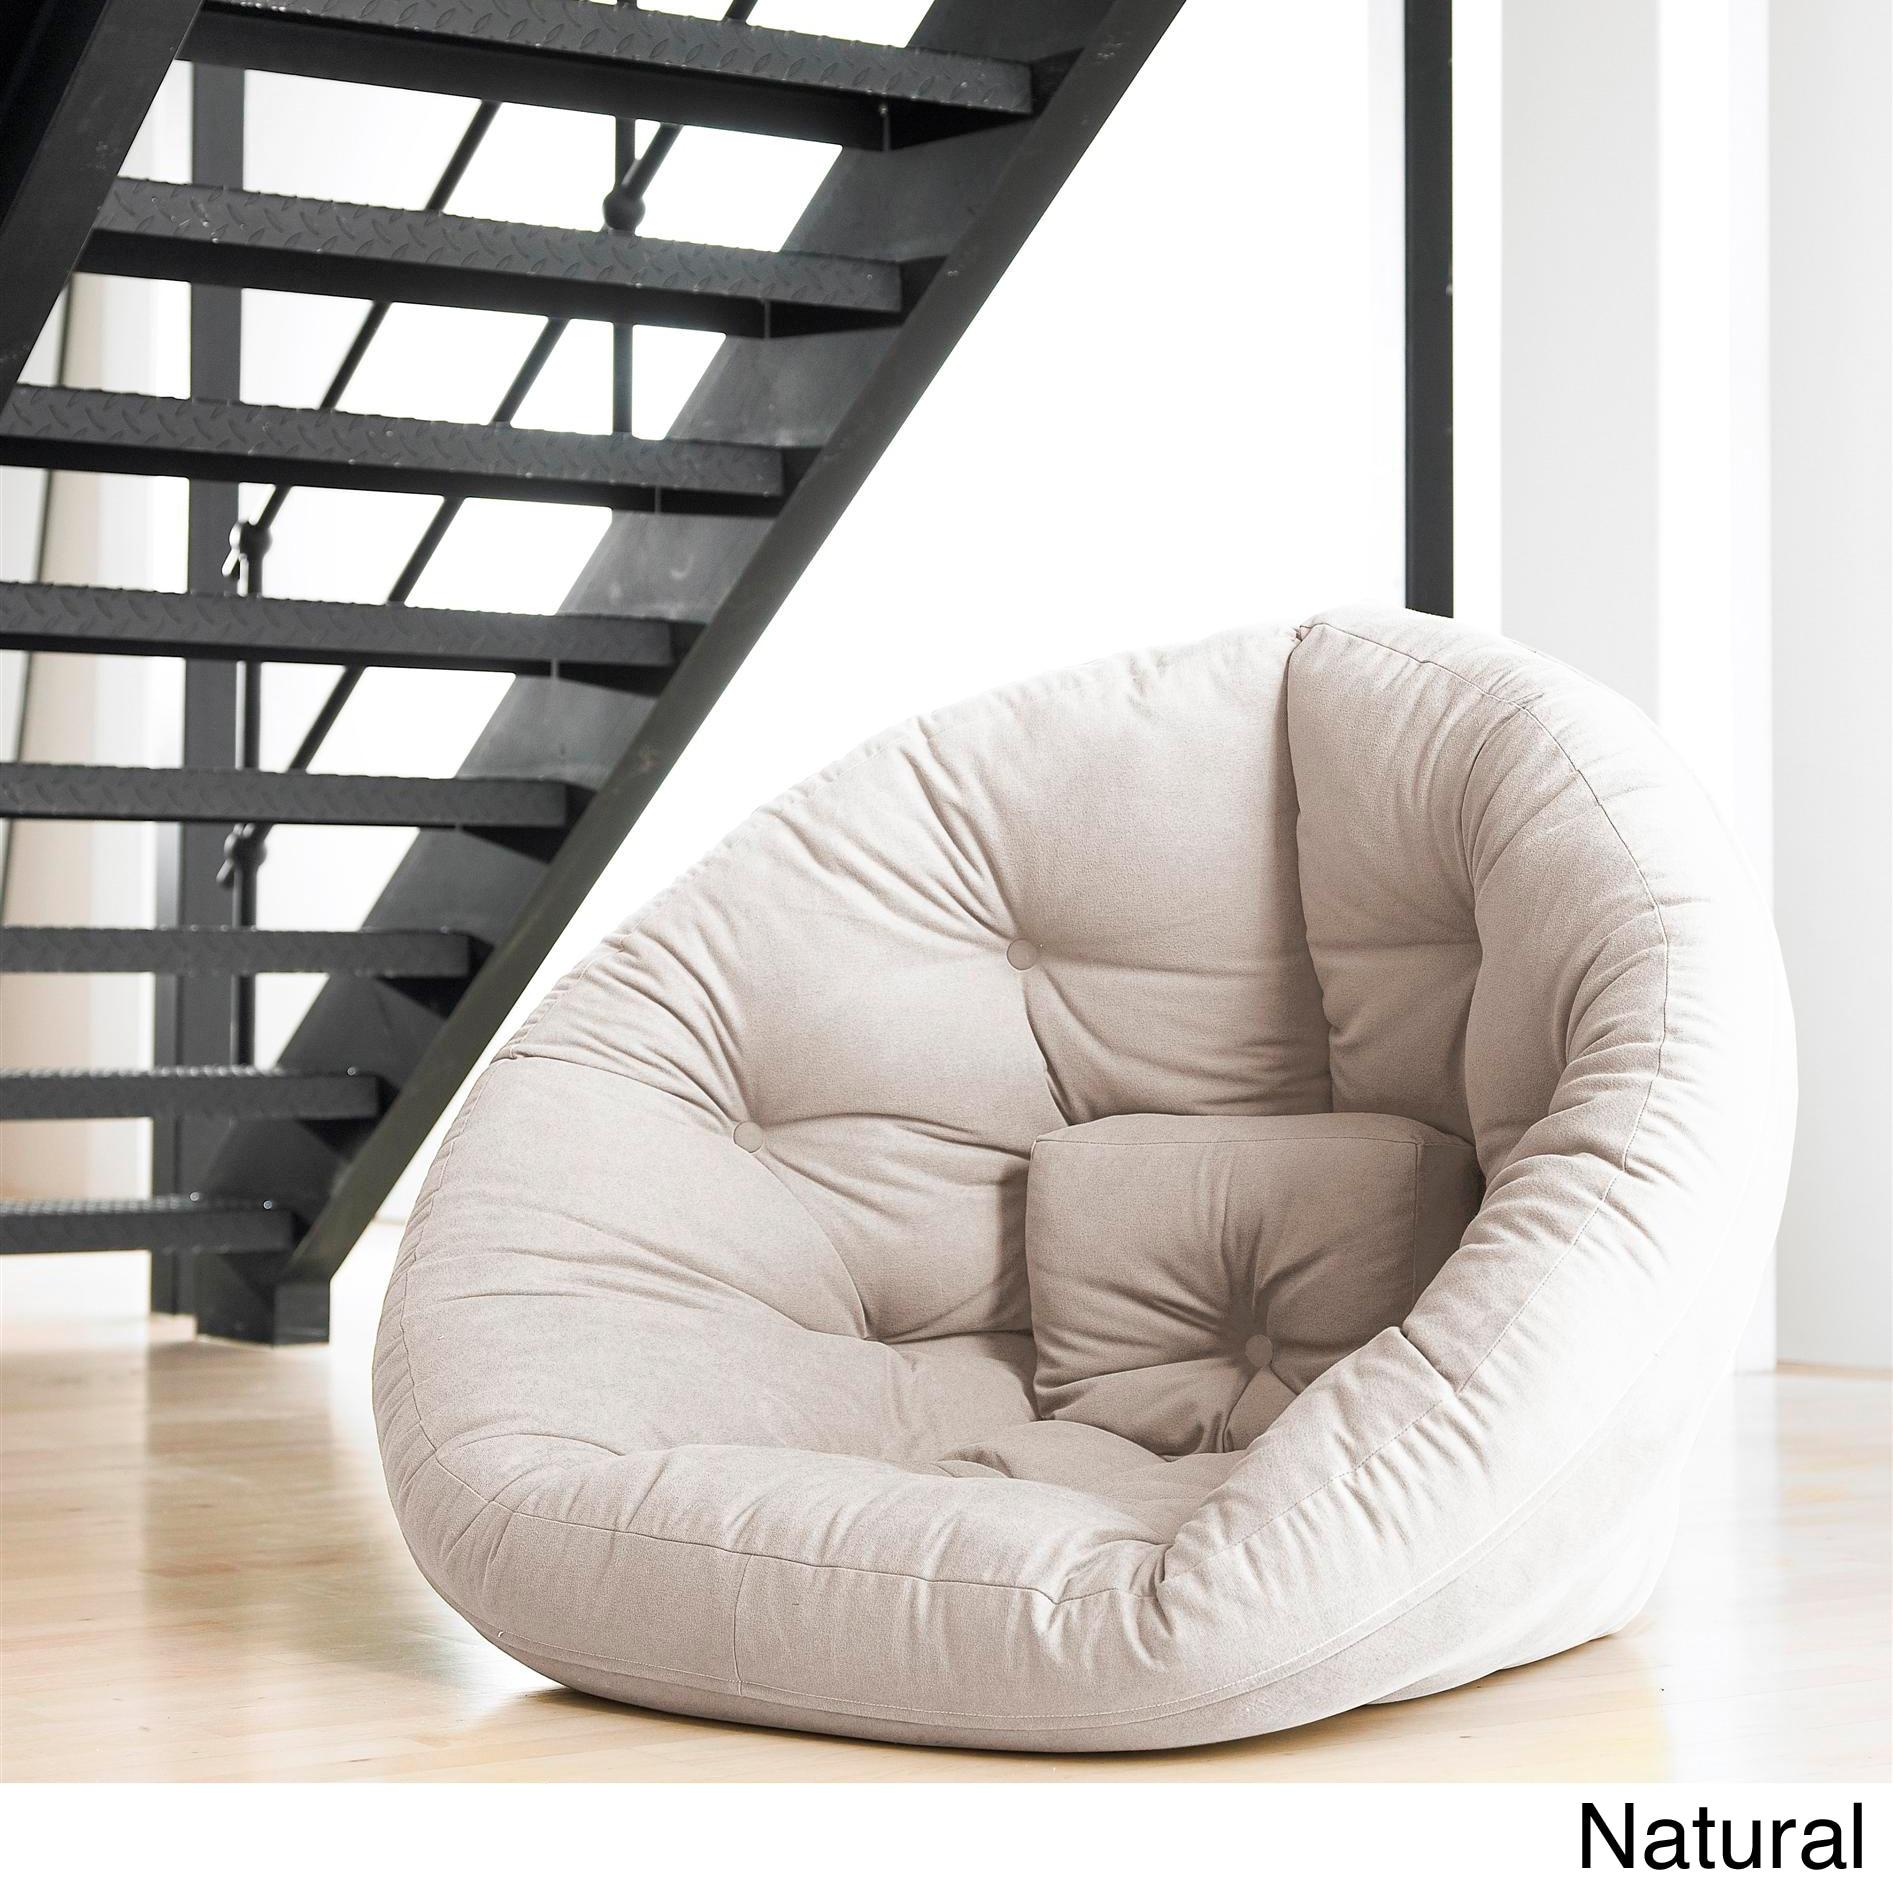 Nest Convertible Futon Chair Bed